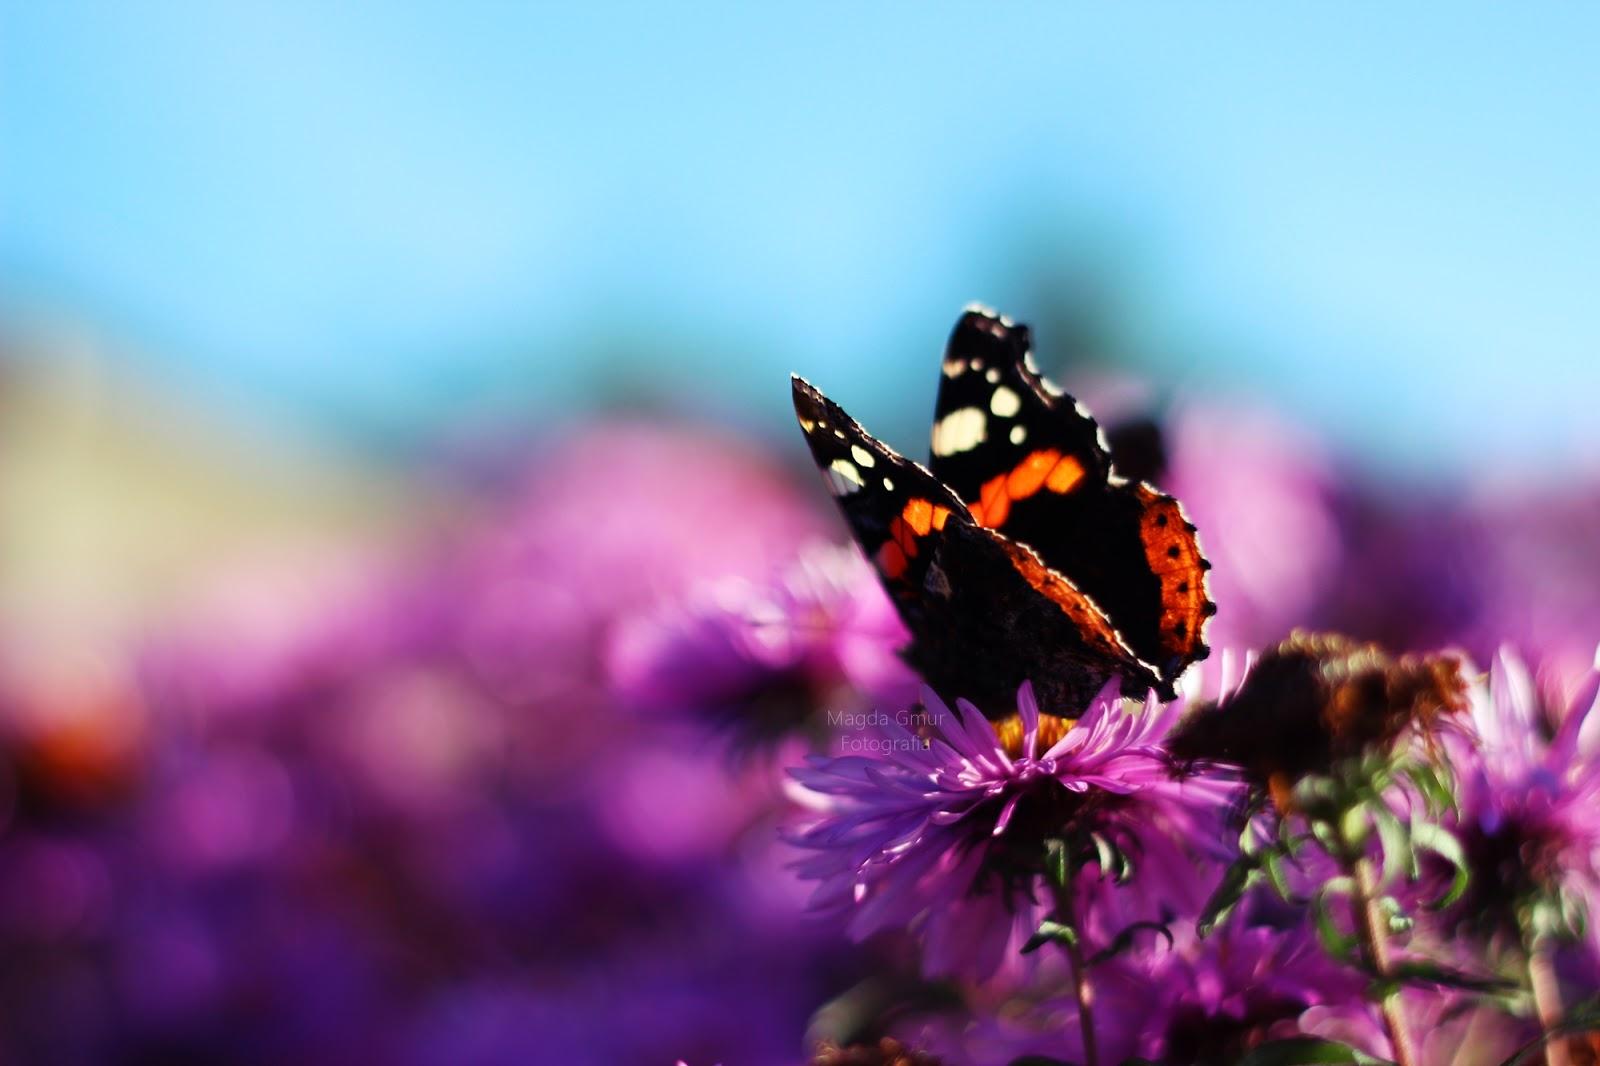 motyle, kwiat, astry, fioletowe astry, kwiaty marcinki, kwiaty michałki